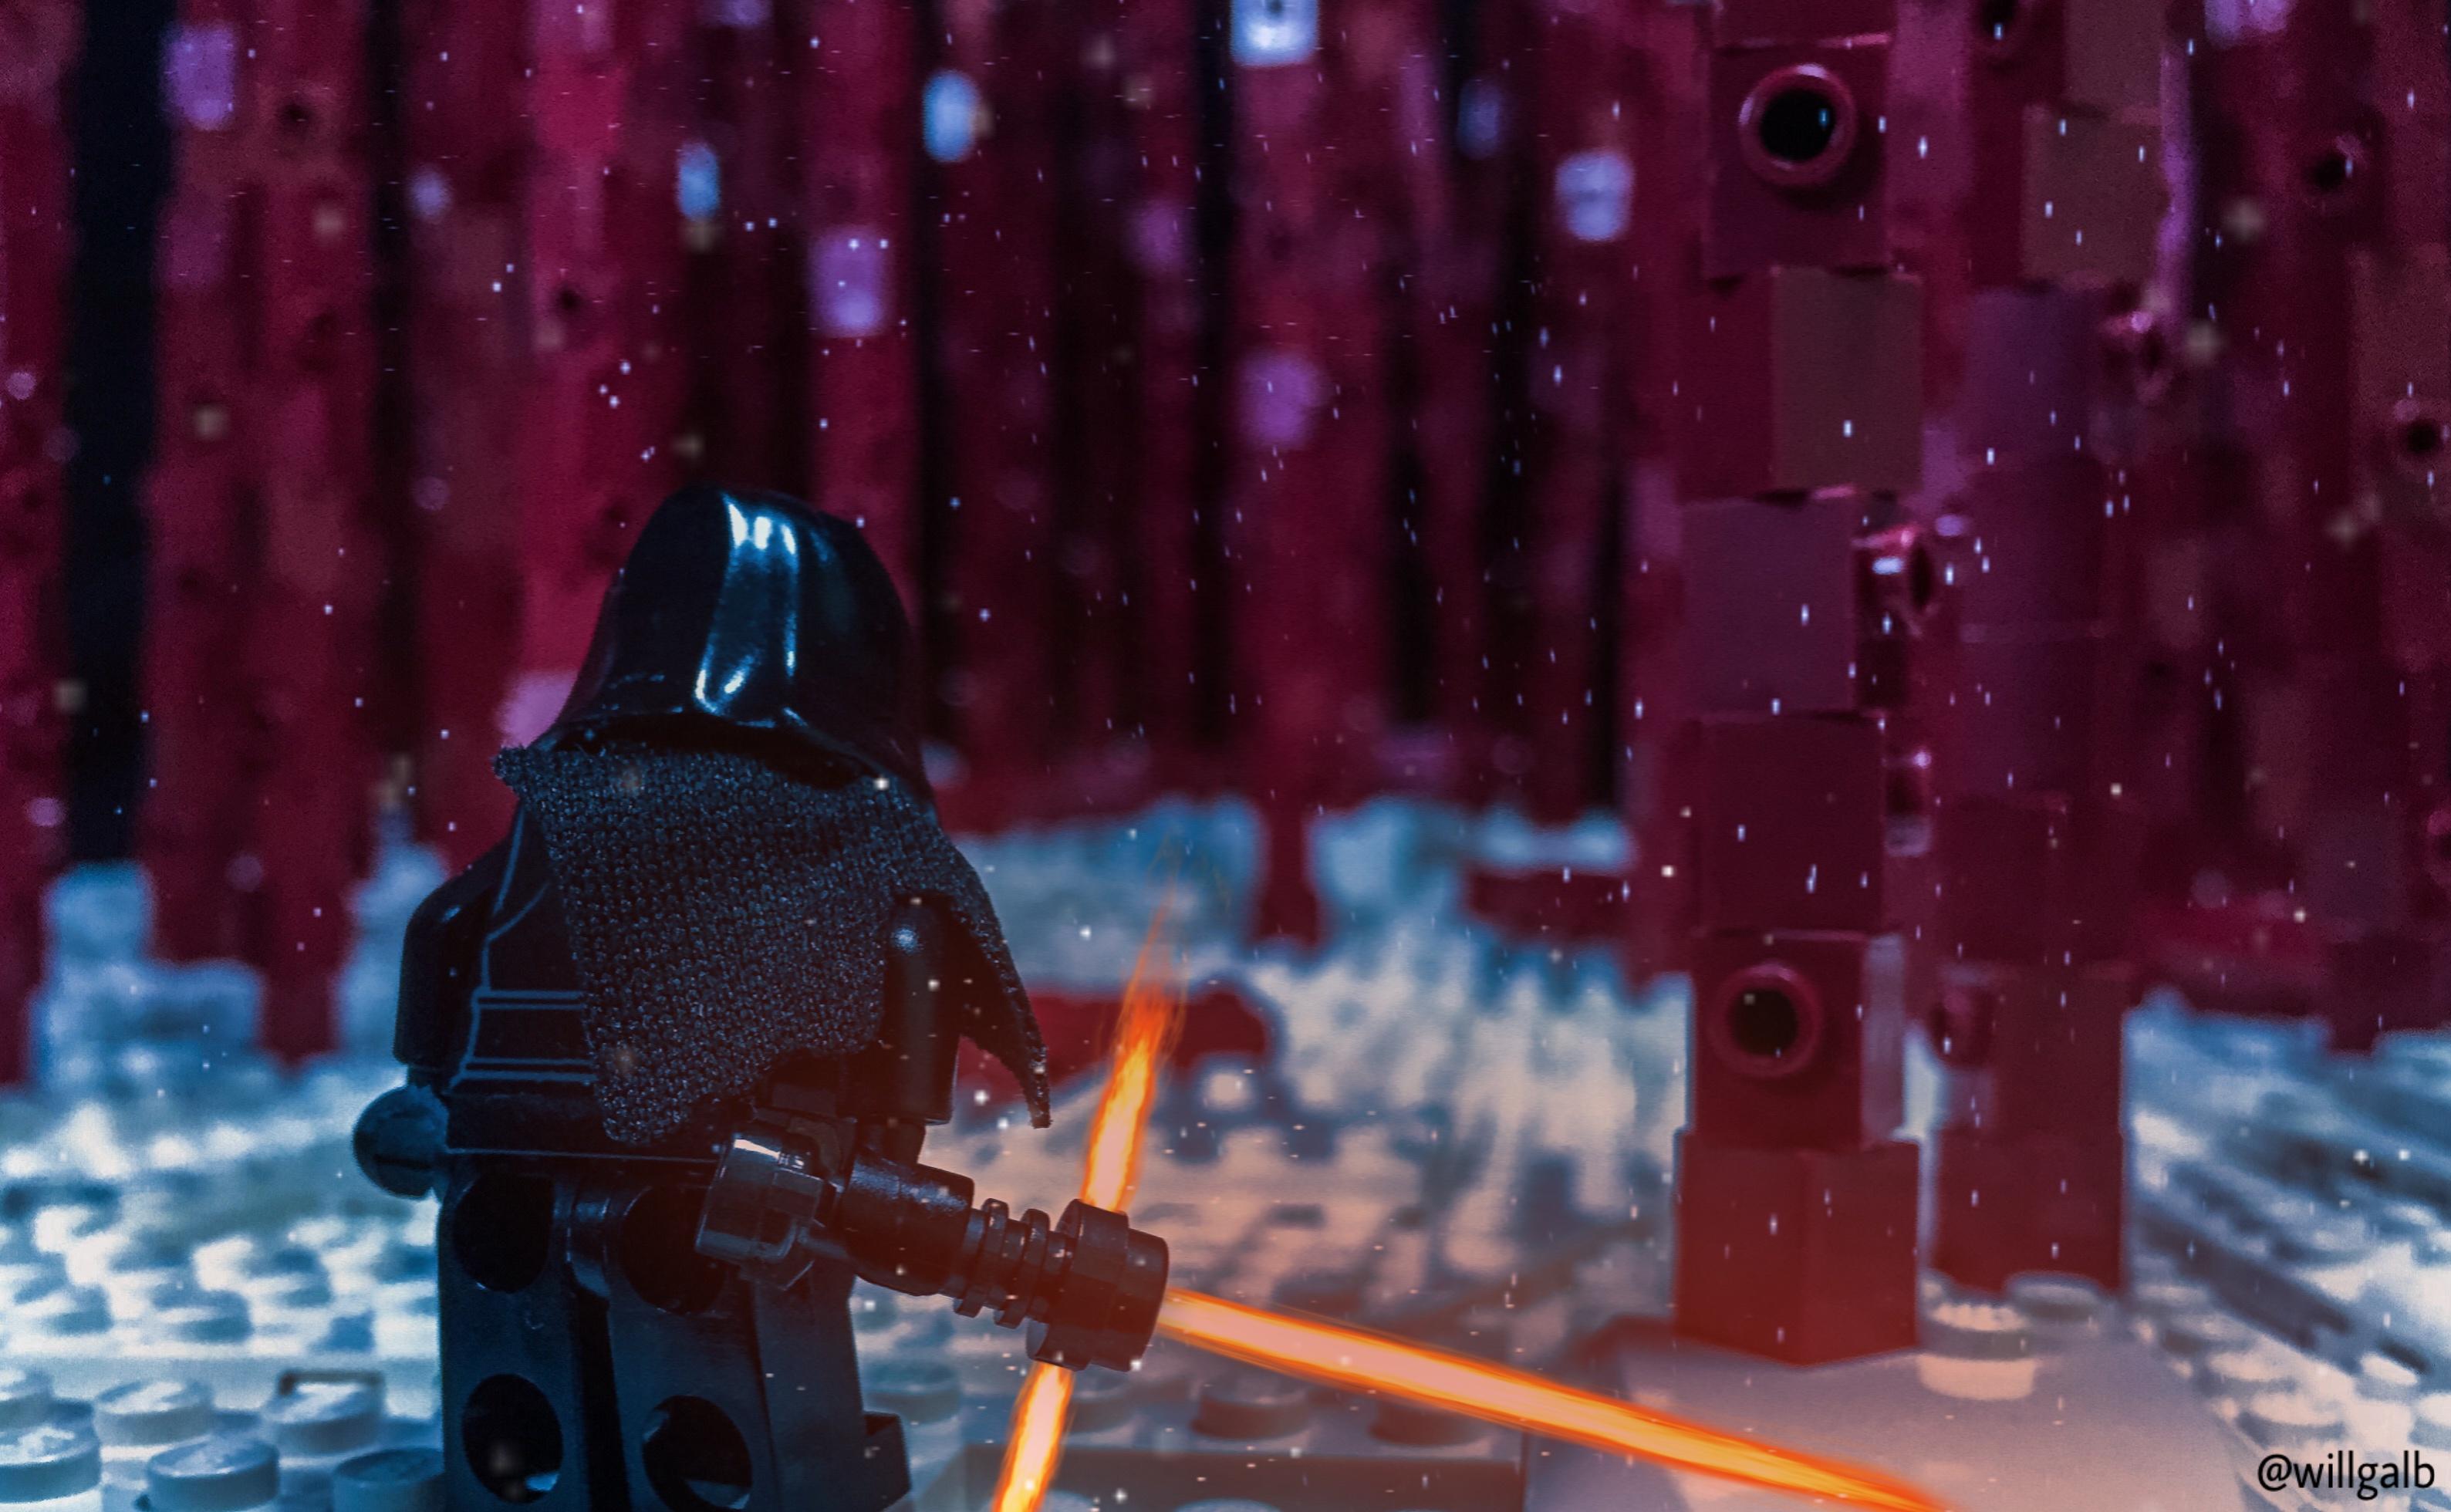 Wallpaper Starwars Lego 7 Duel Lightsaber Minifig Crossguard Episodevii Forceawakens Kyloren Starkillerbase 3177x1960 943100 Hd Wallpapers Wallhere